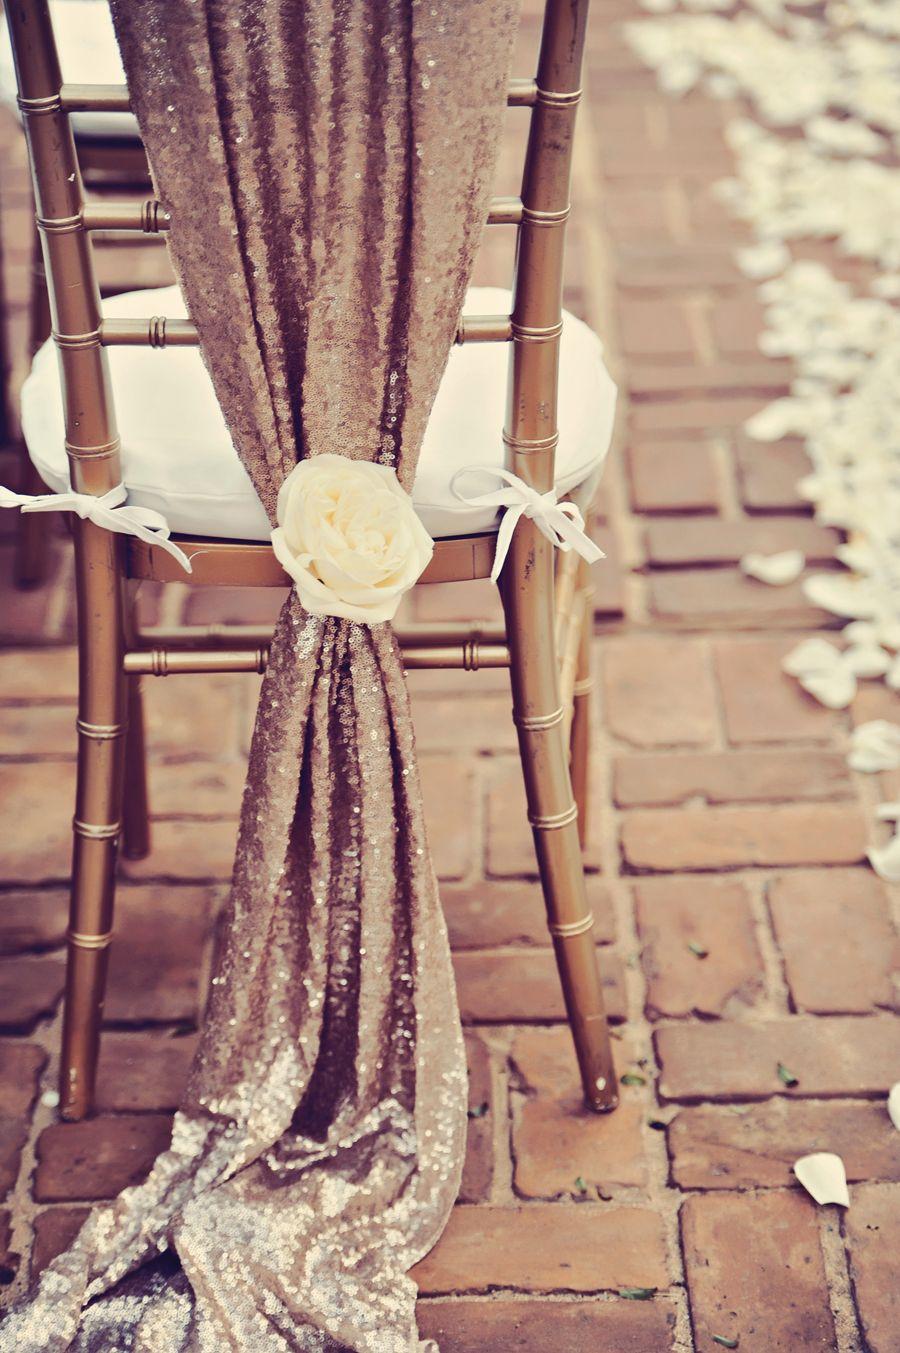 Event Planning & Design: Belle Destination Weddings & Events, Inc. - http://www.stylemepretty.com/portfolio/belle-destination Wedding Venue: Haiku Mill - http://www.stylemepretty.com/portfolio/haikumill Photography: Tamiz Photography - http://www.stylemepretty.com/portfolio/tamiz-photography   Read More on SMP: http://www.stylemepretty.com/2014/08/27/glamorous-maui-destination-wedding/